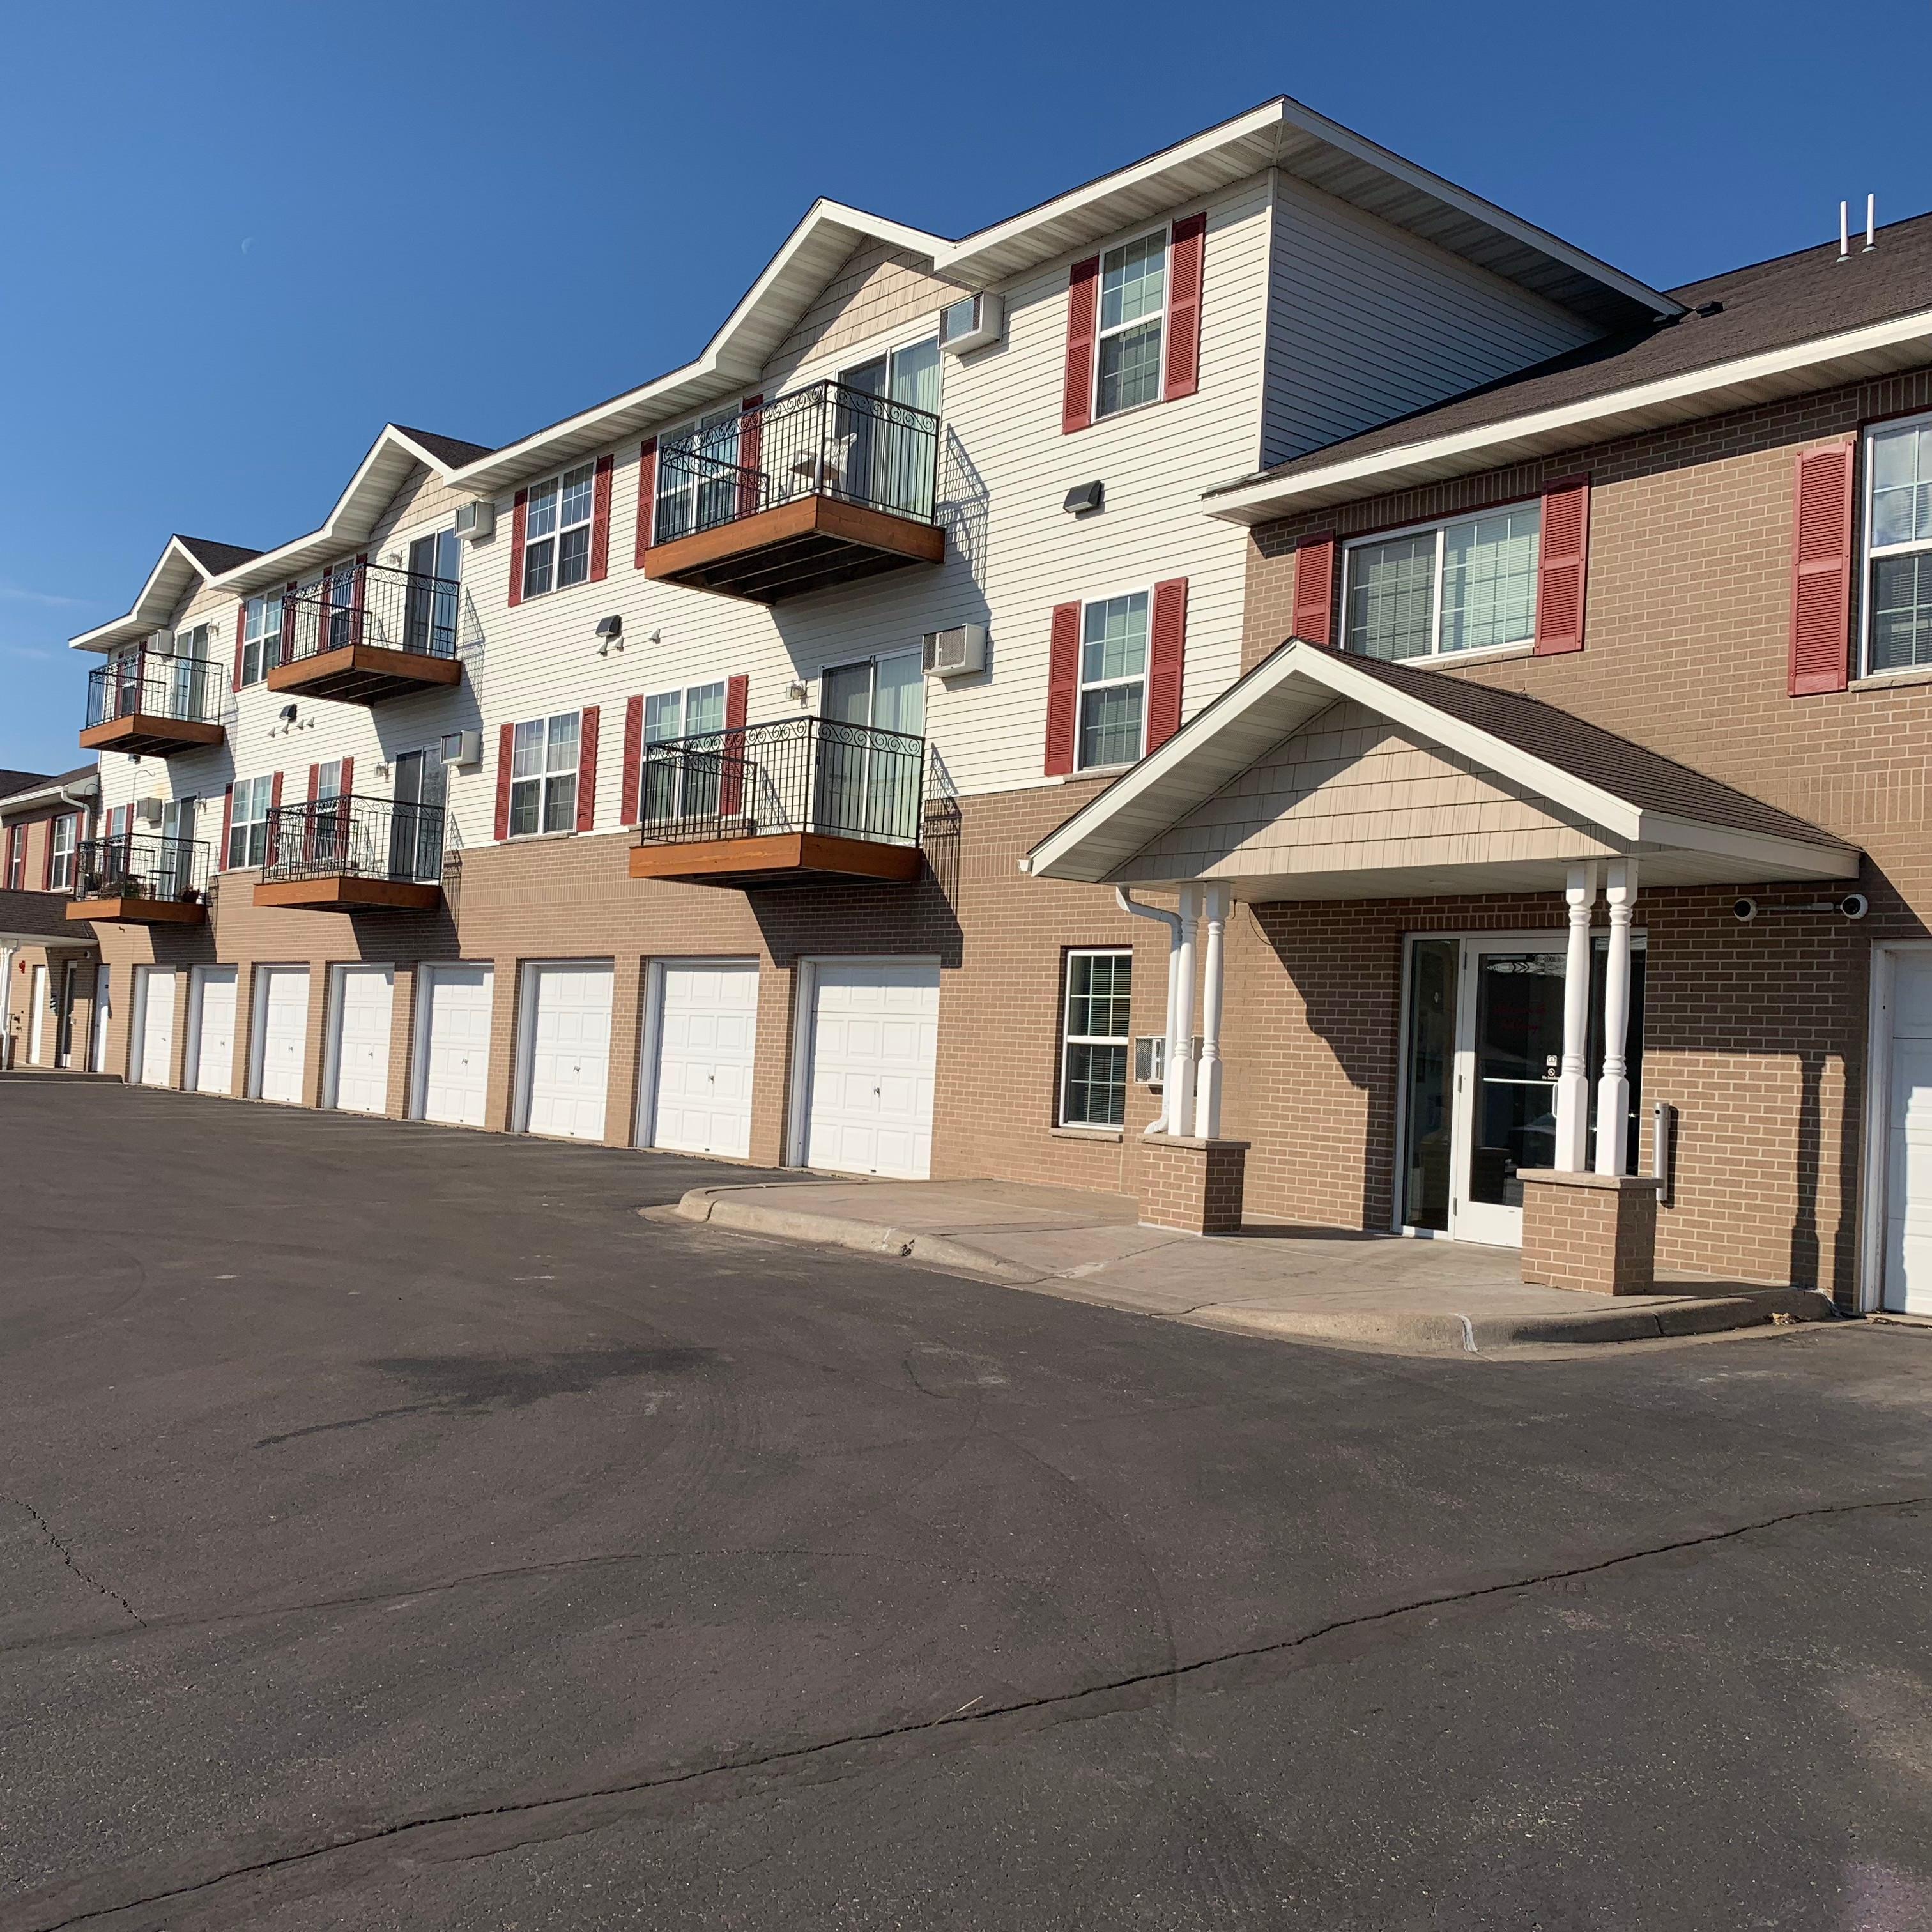 Ashbury Apartments: Briggscompanies